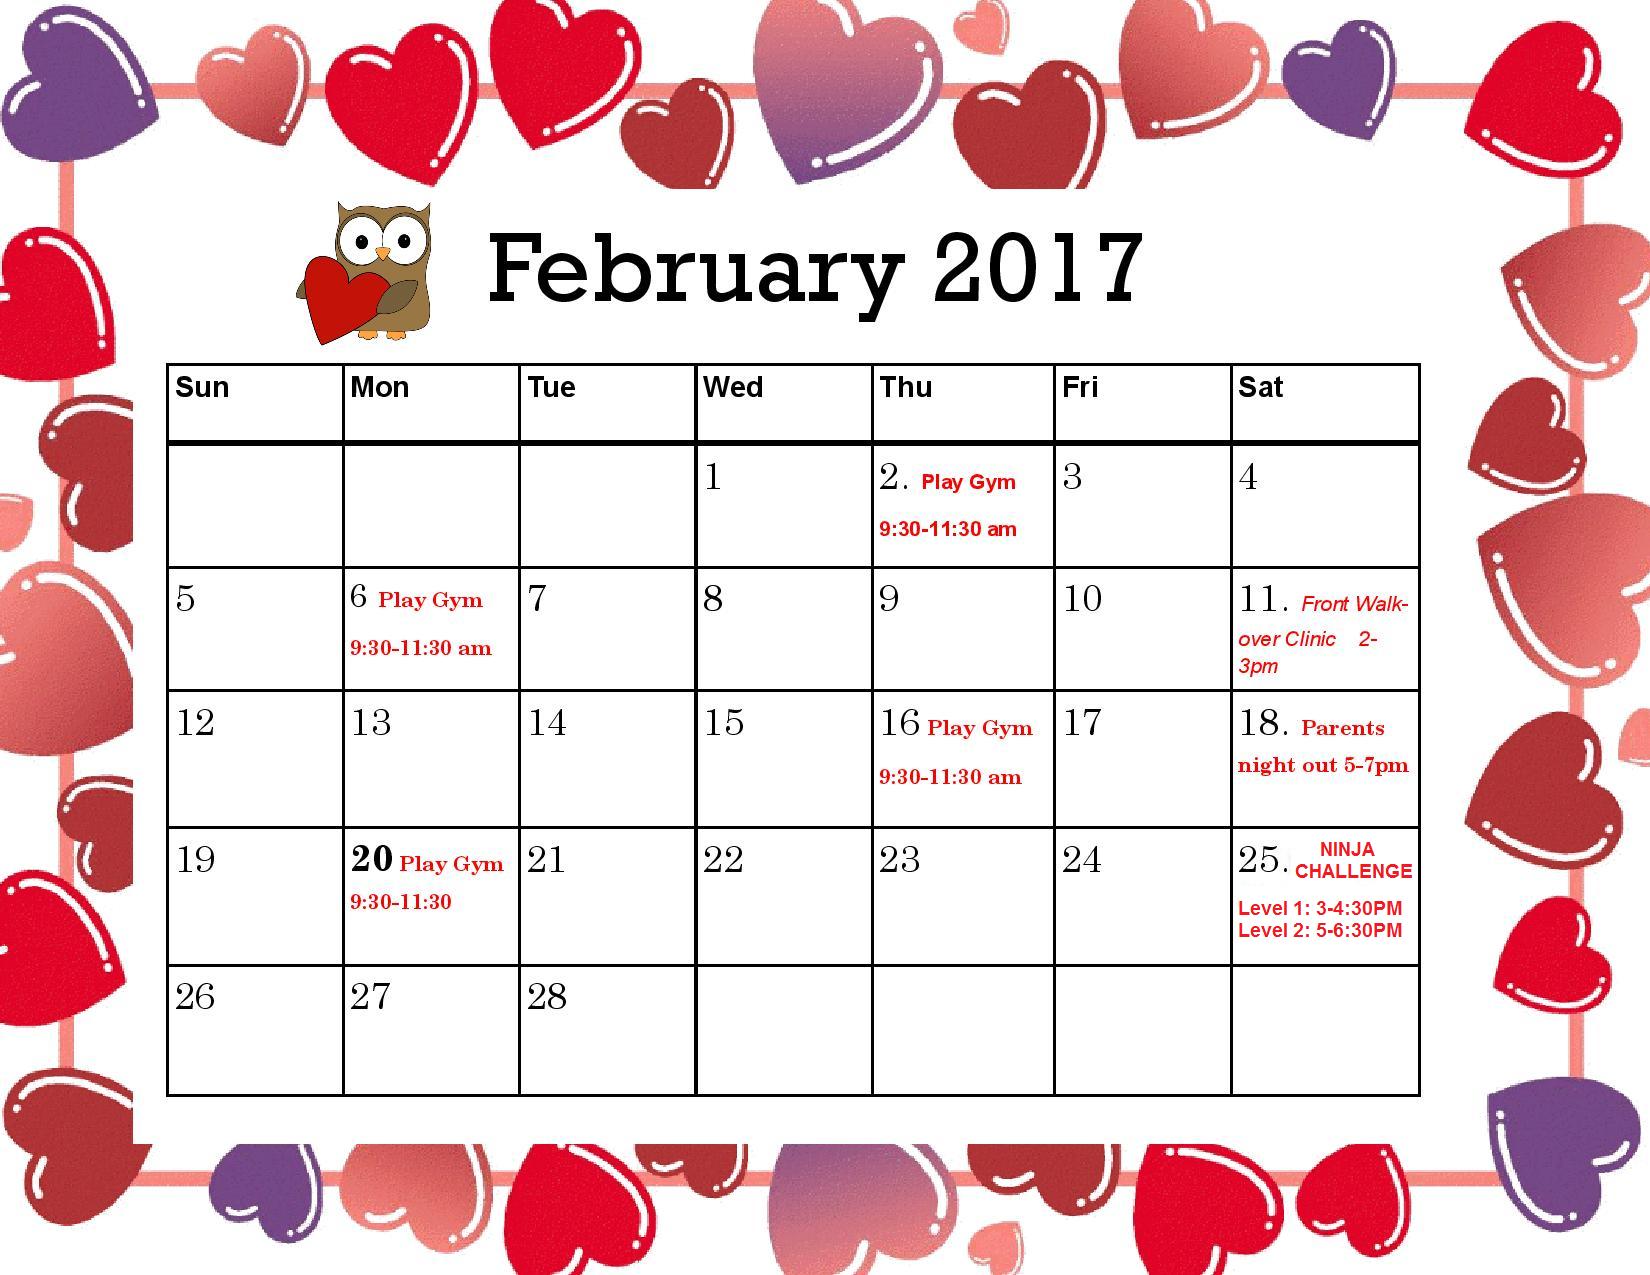 Rotterdam February 2017 Calendar